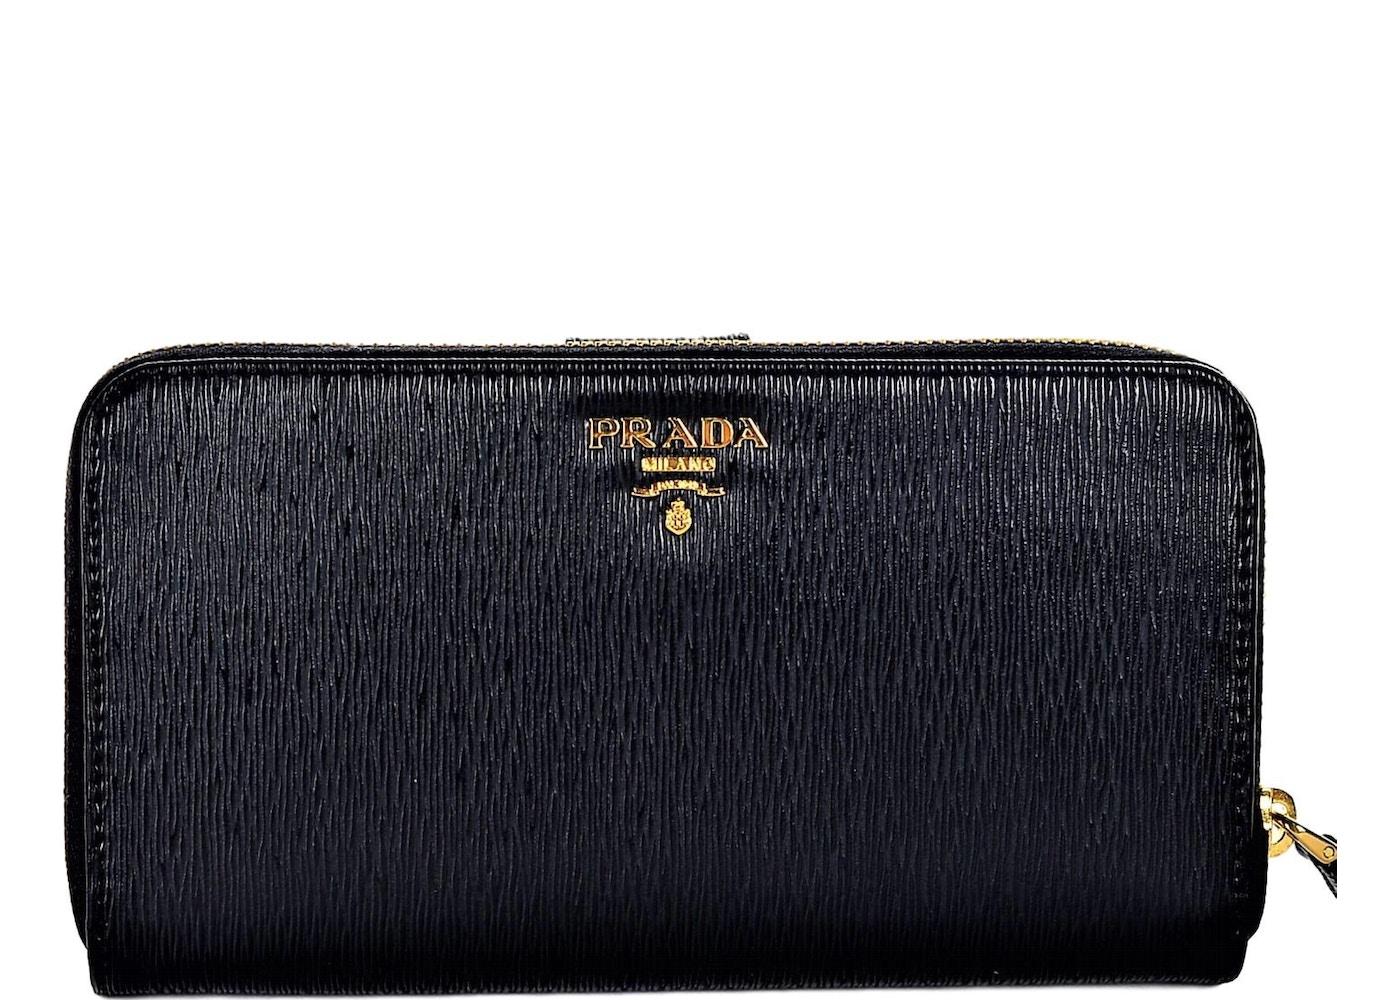 dd97b5644c2460 Buy & Sell Prada Luxury Handbags